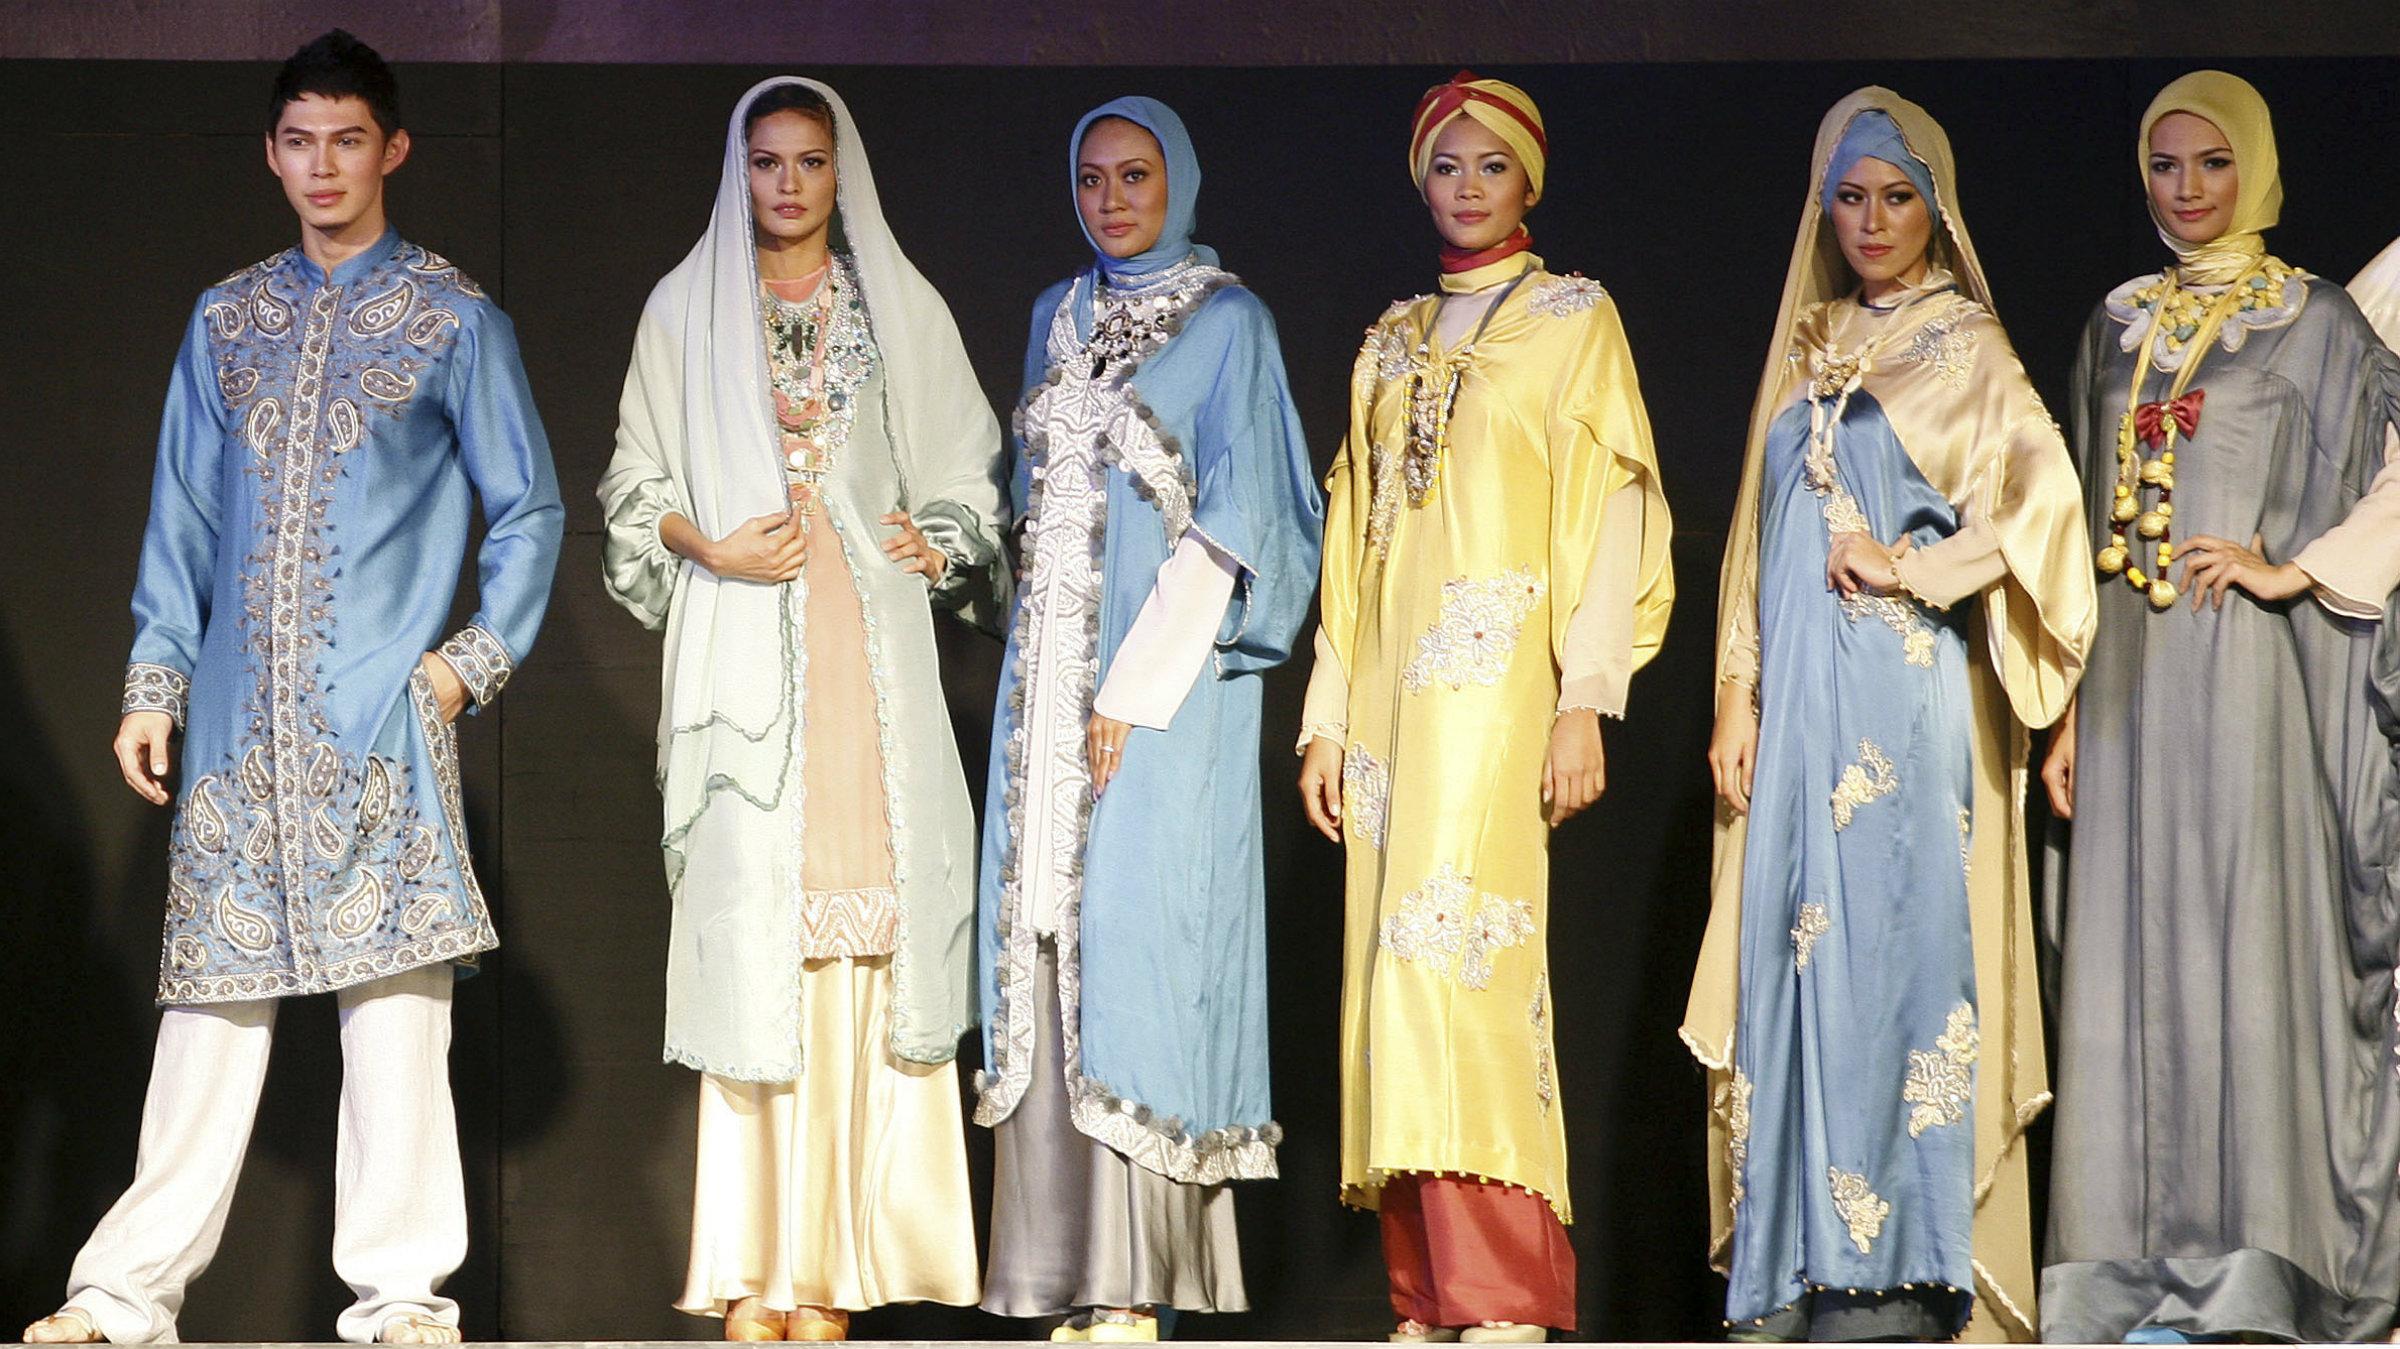 Muslims fashion show.